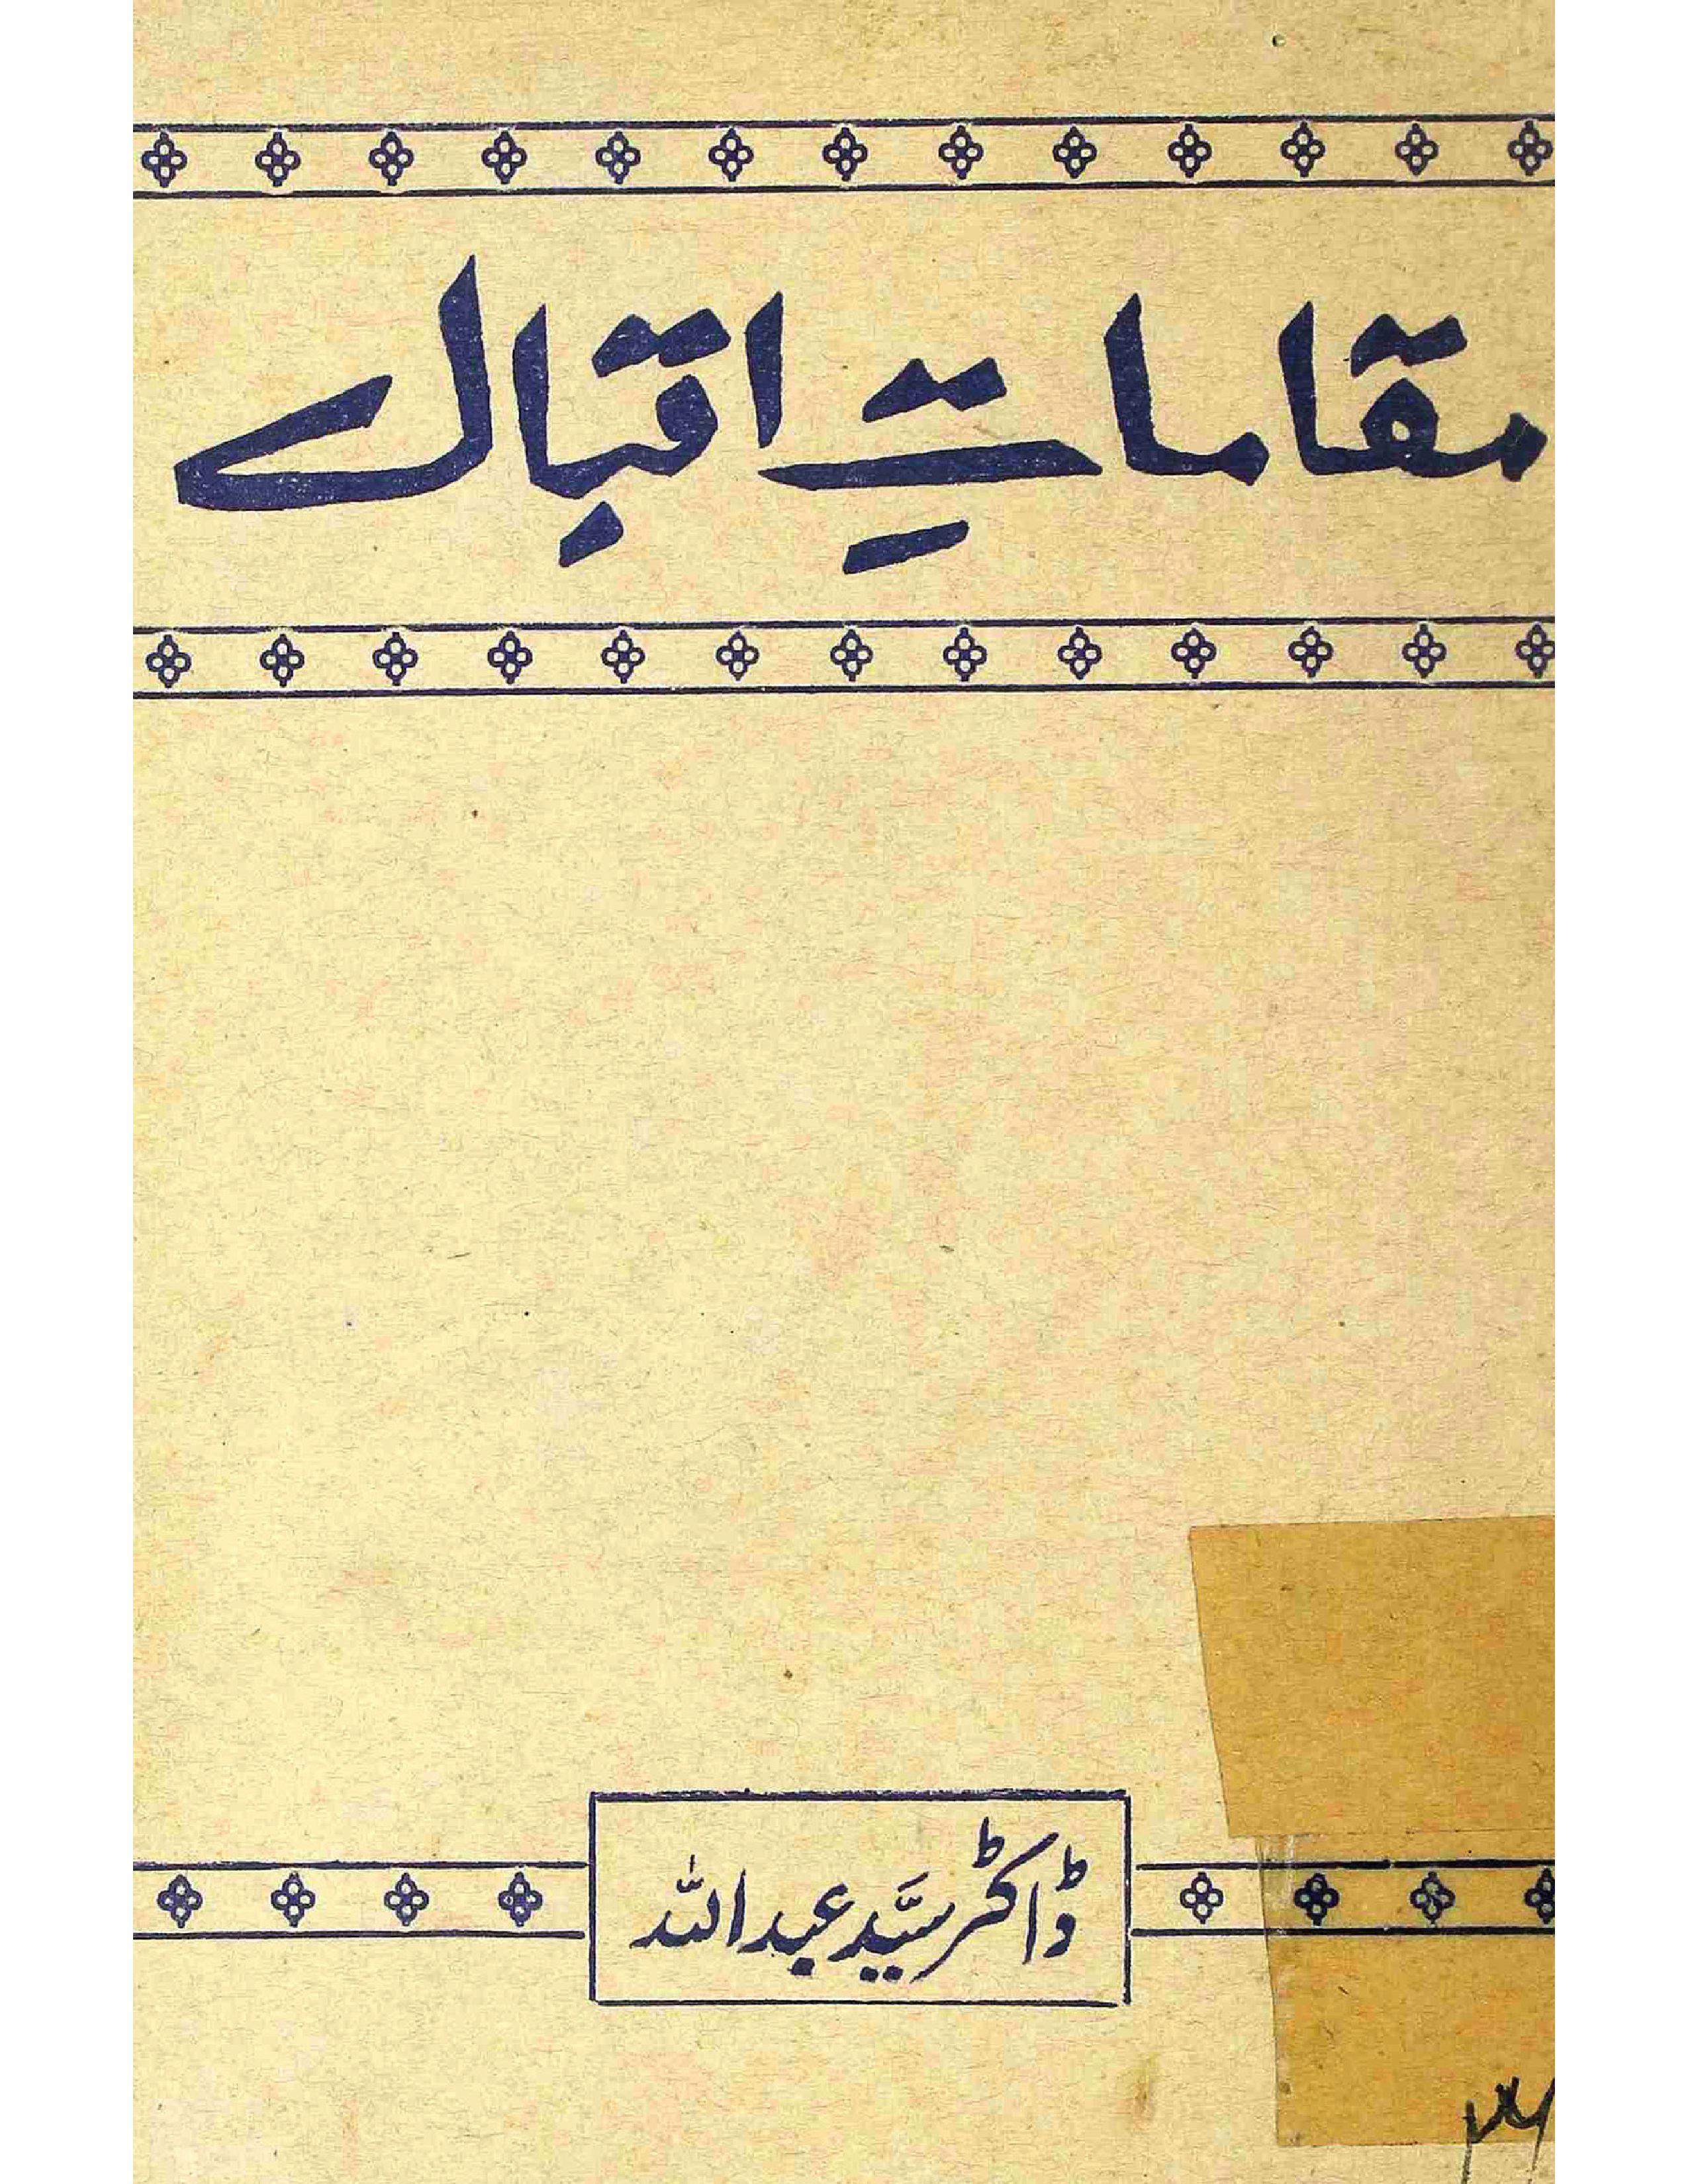 Maqamat-e-Iqbal